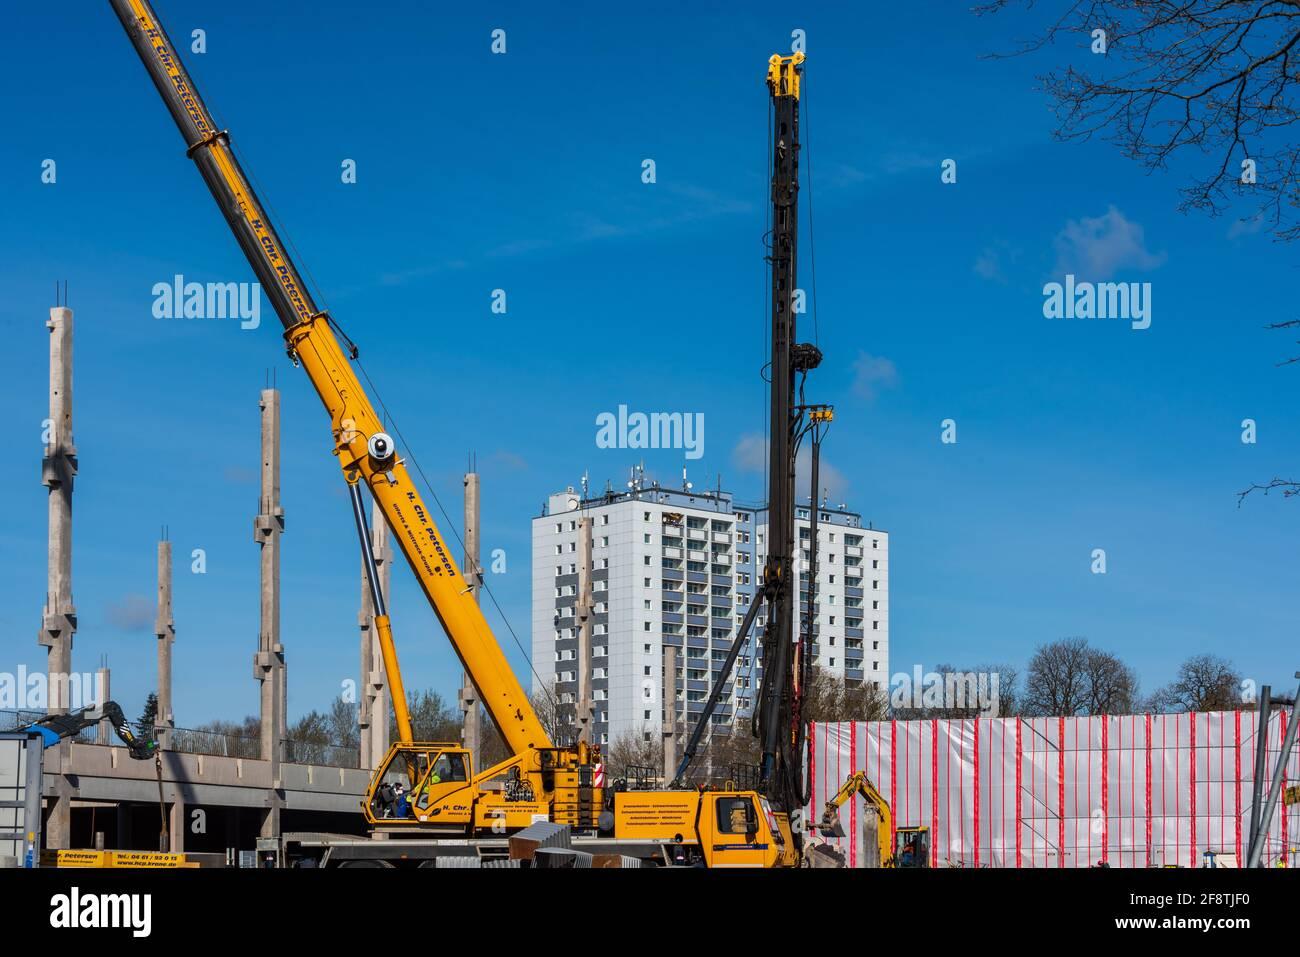 Neubau eines Möbelhauses in Kiel Schleswig-Holstein Stockfoto